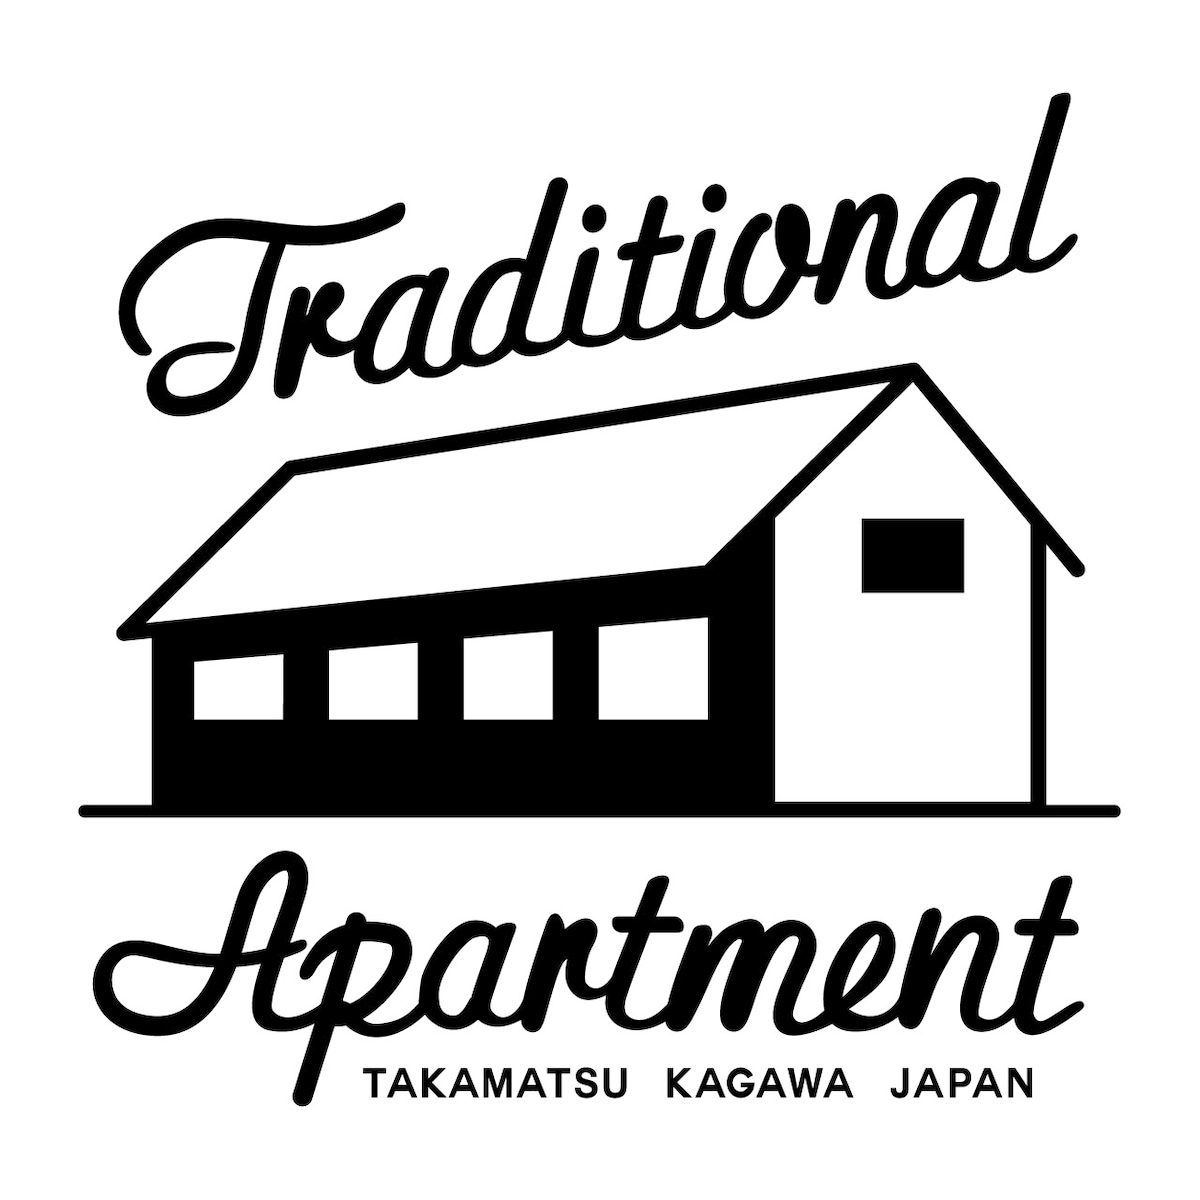 Traditional Apartment from Takamatsu